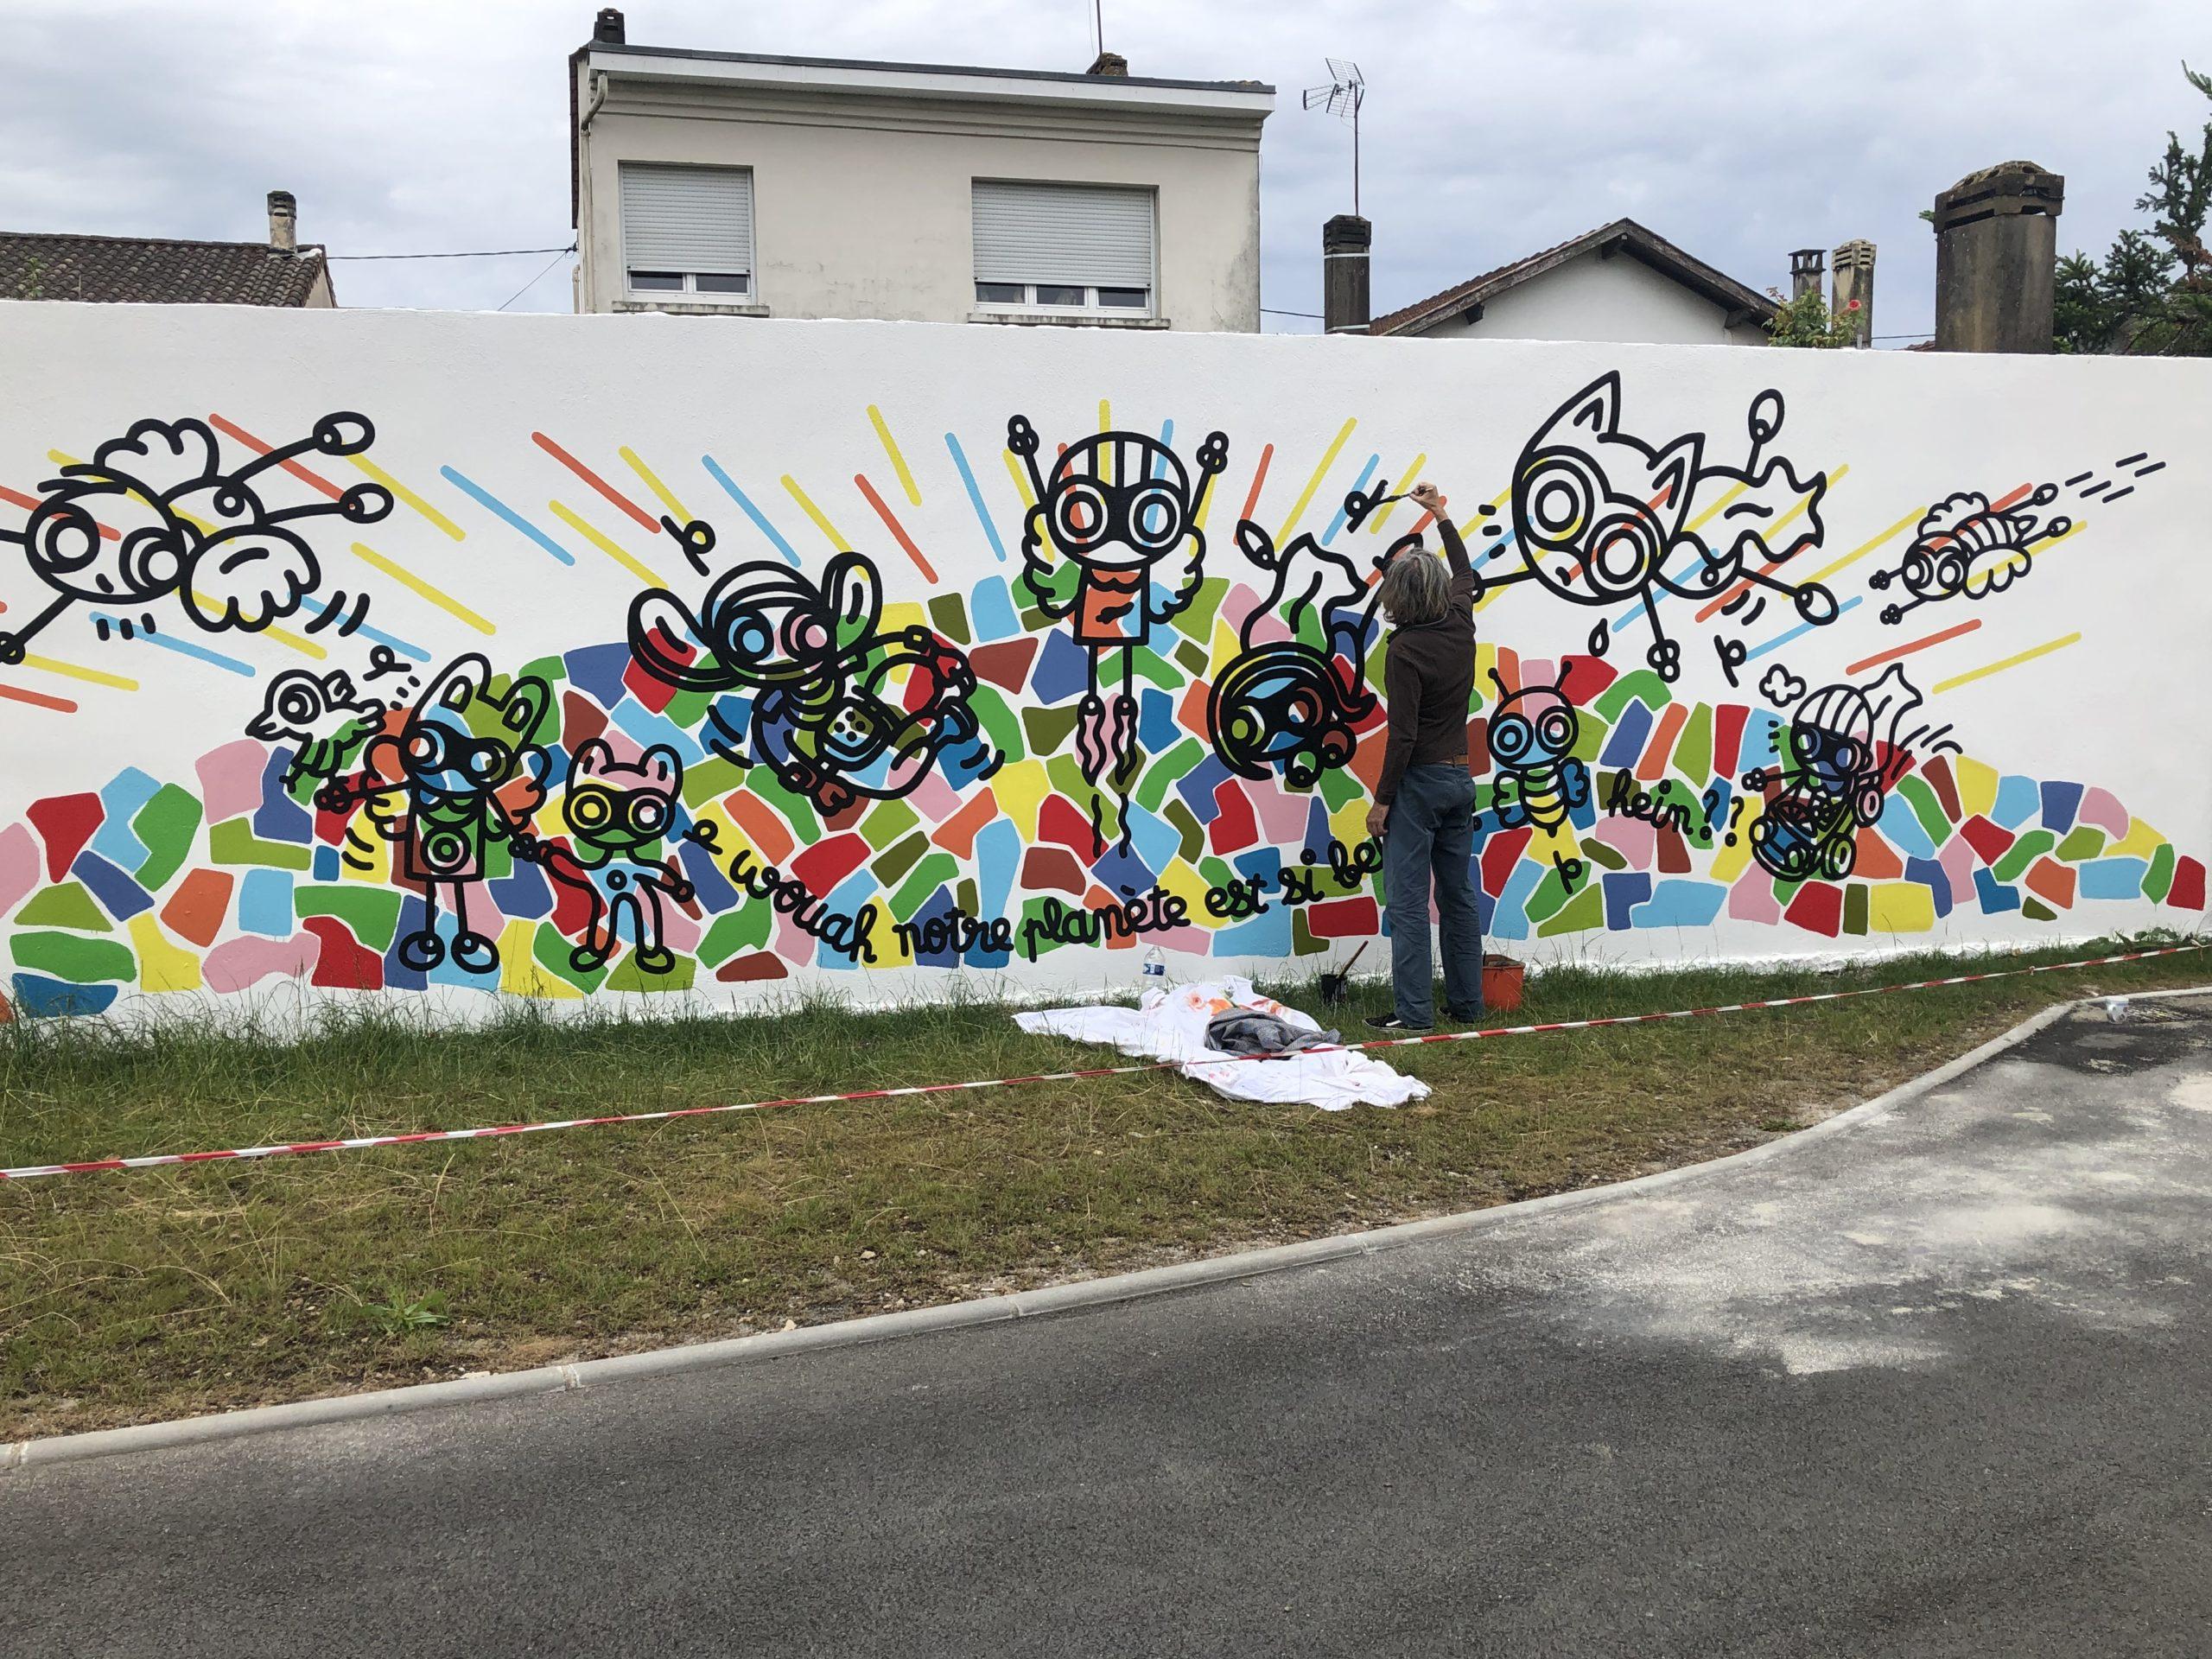 École maternelle Gambetta - Cenon - 11m x 3m